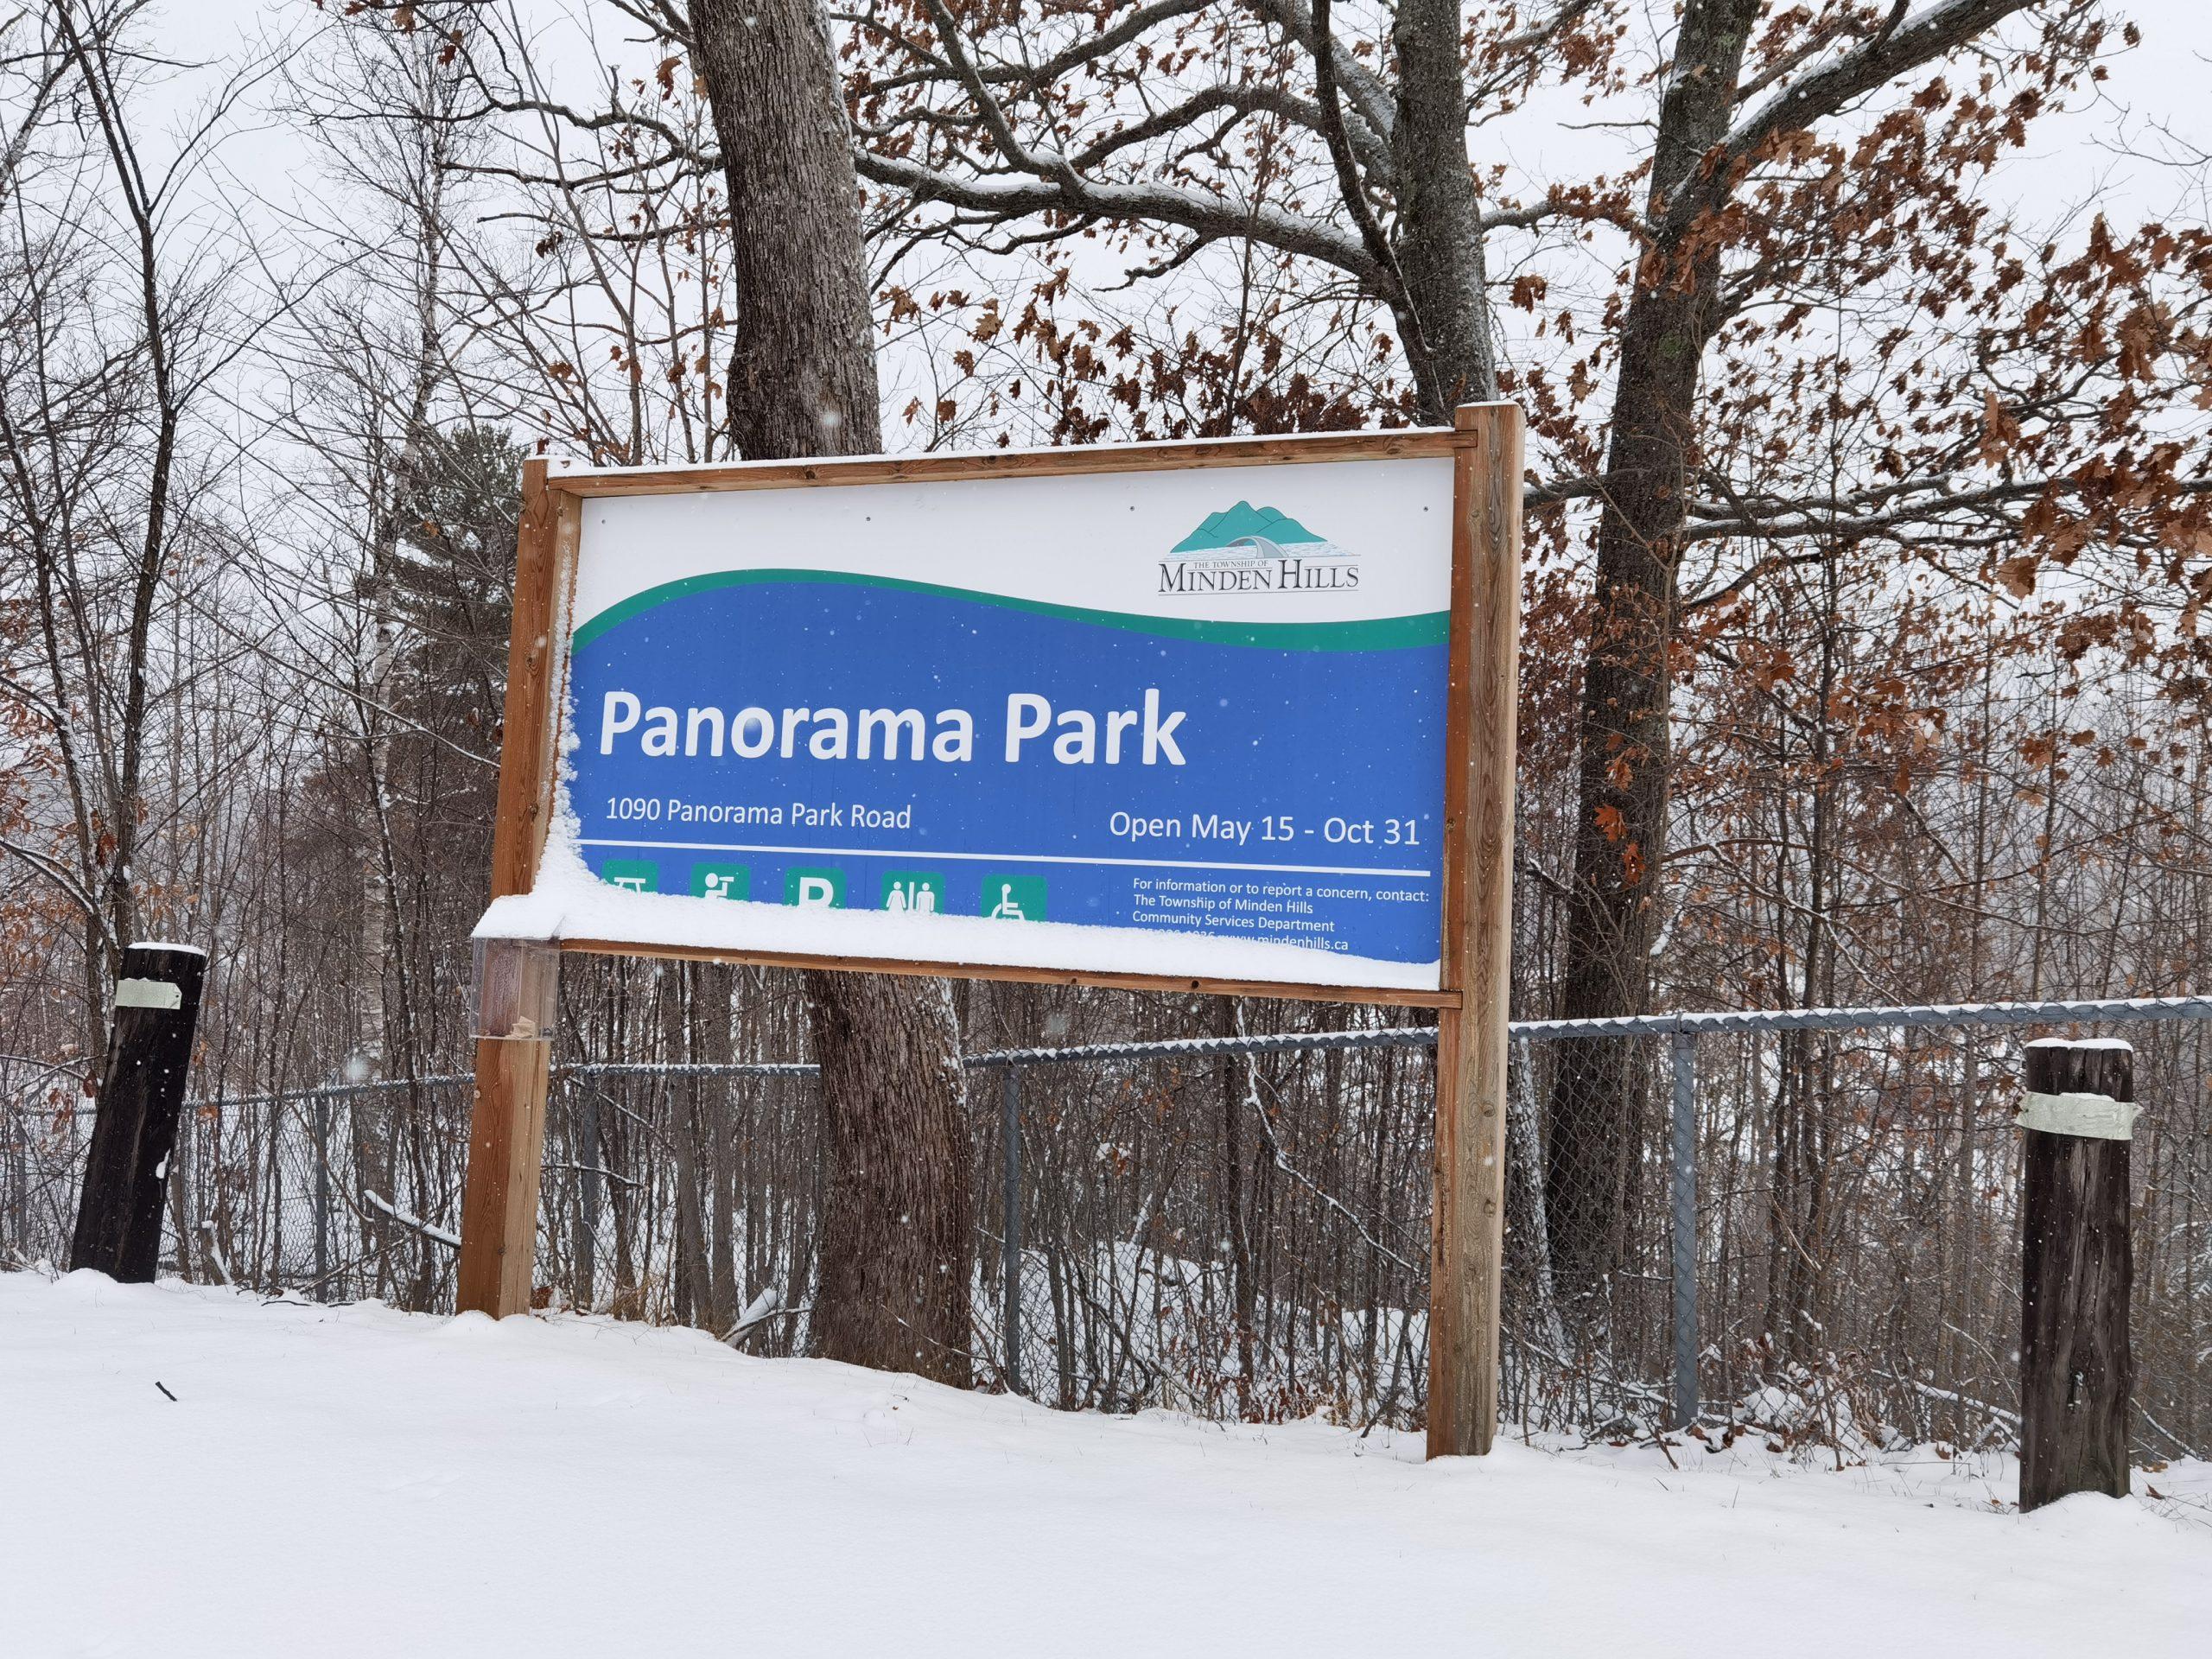 Panorama Park – Minden, Ontario, Canada [ONTARIO TRAVEL SERIES]